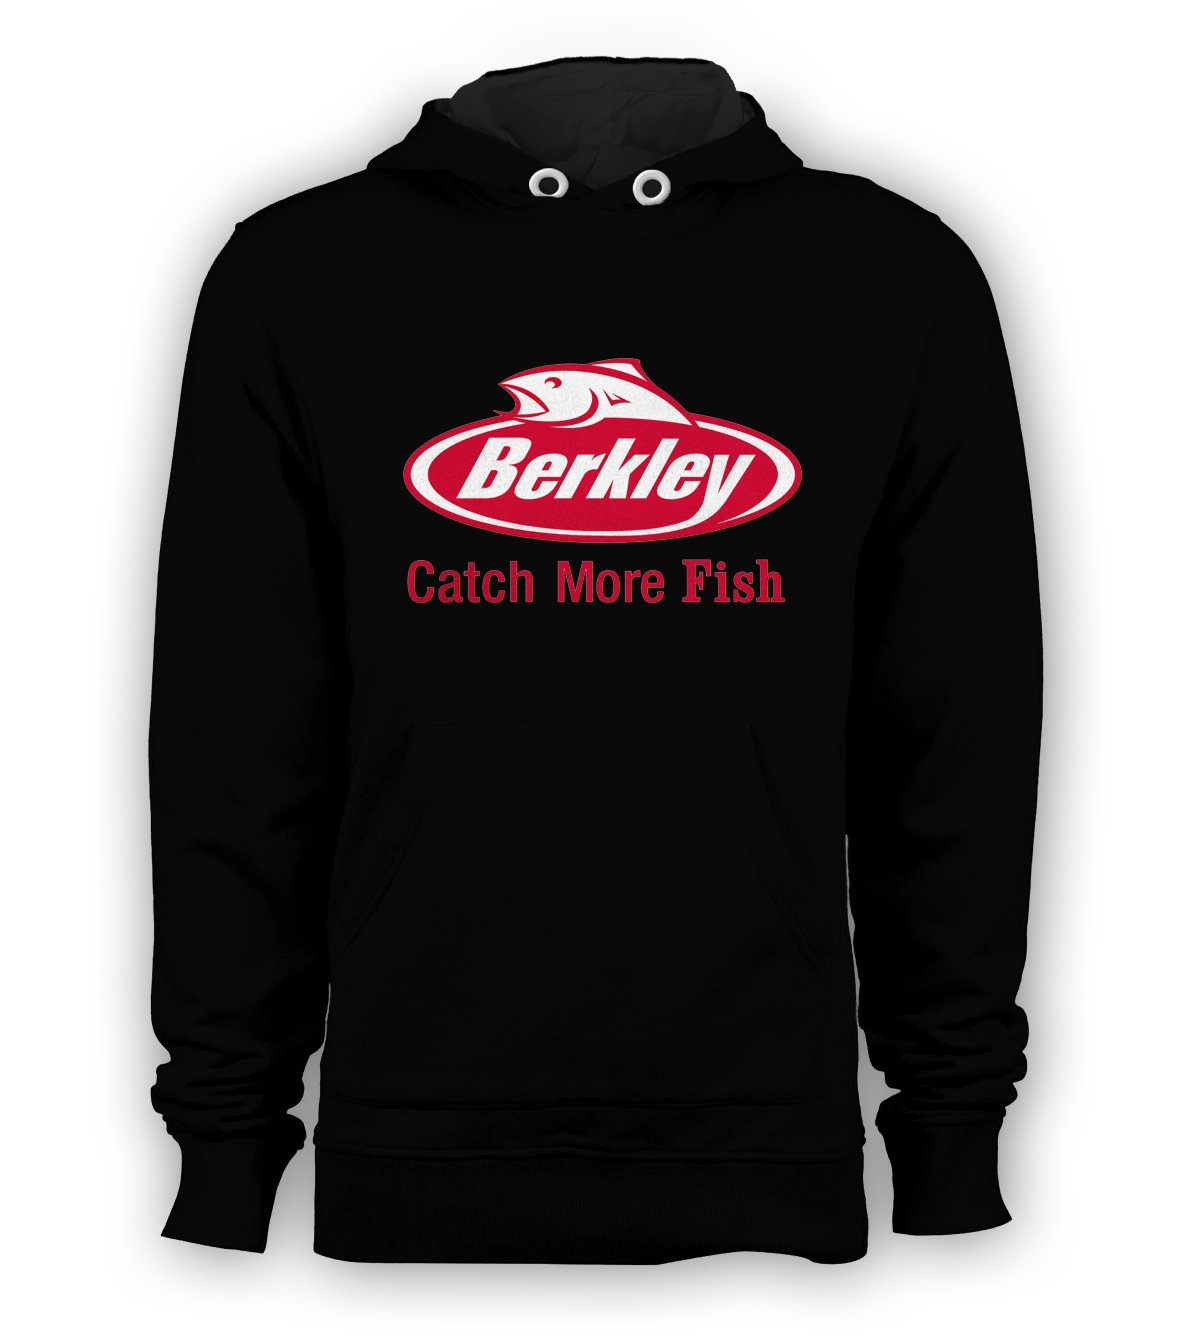 Berkley Fishing Pullover Hoodie Men Sweatshirts Size S to 3XL New Black